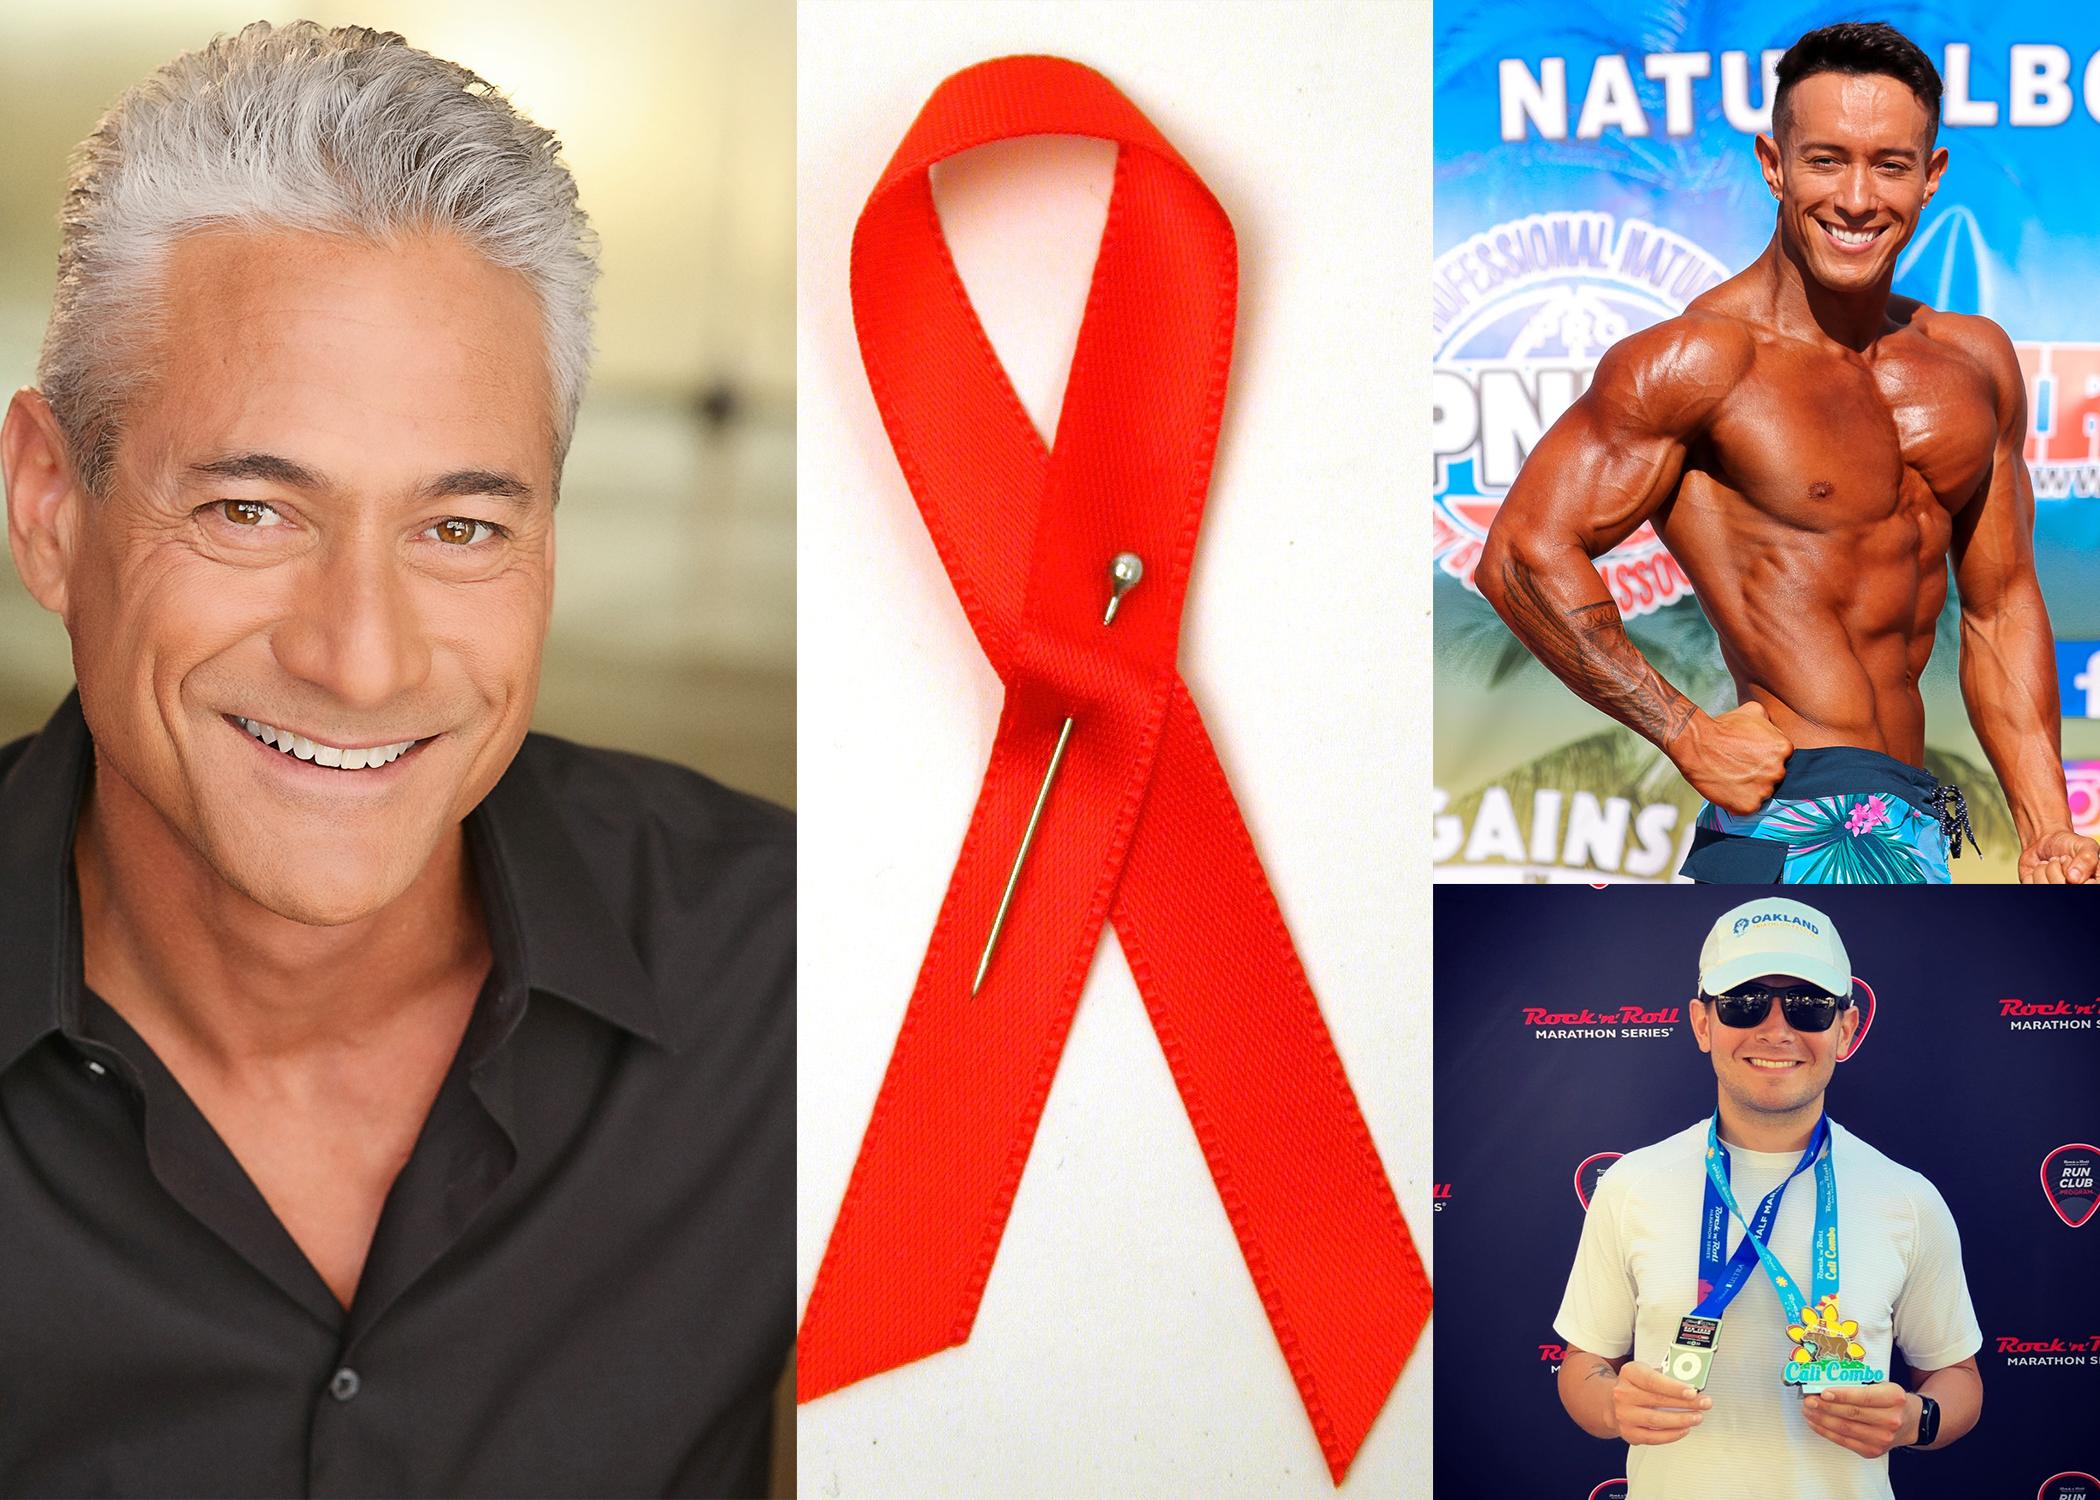 Olympian Greg Louganis, Bodybuilder Raif Derrazi and Triathlete Josh Hipps next to a red AIDS awareness ribbon.